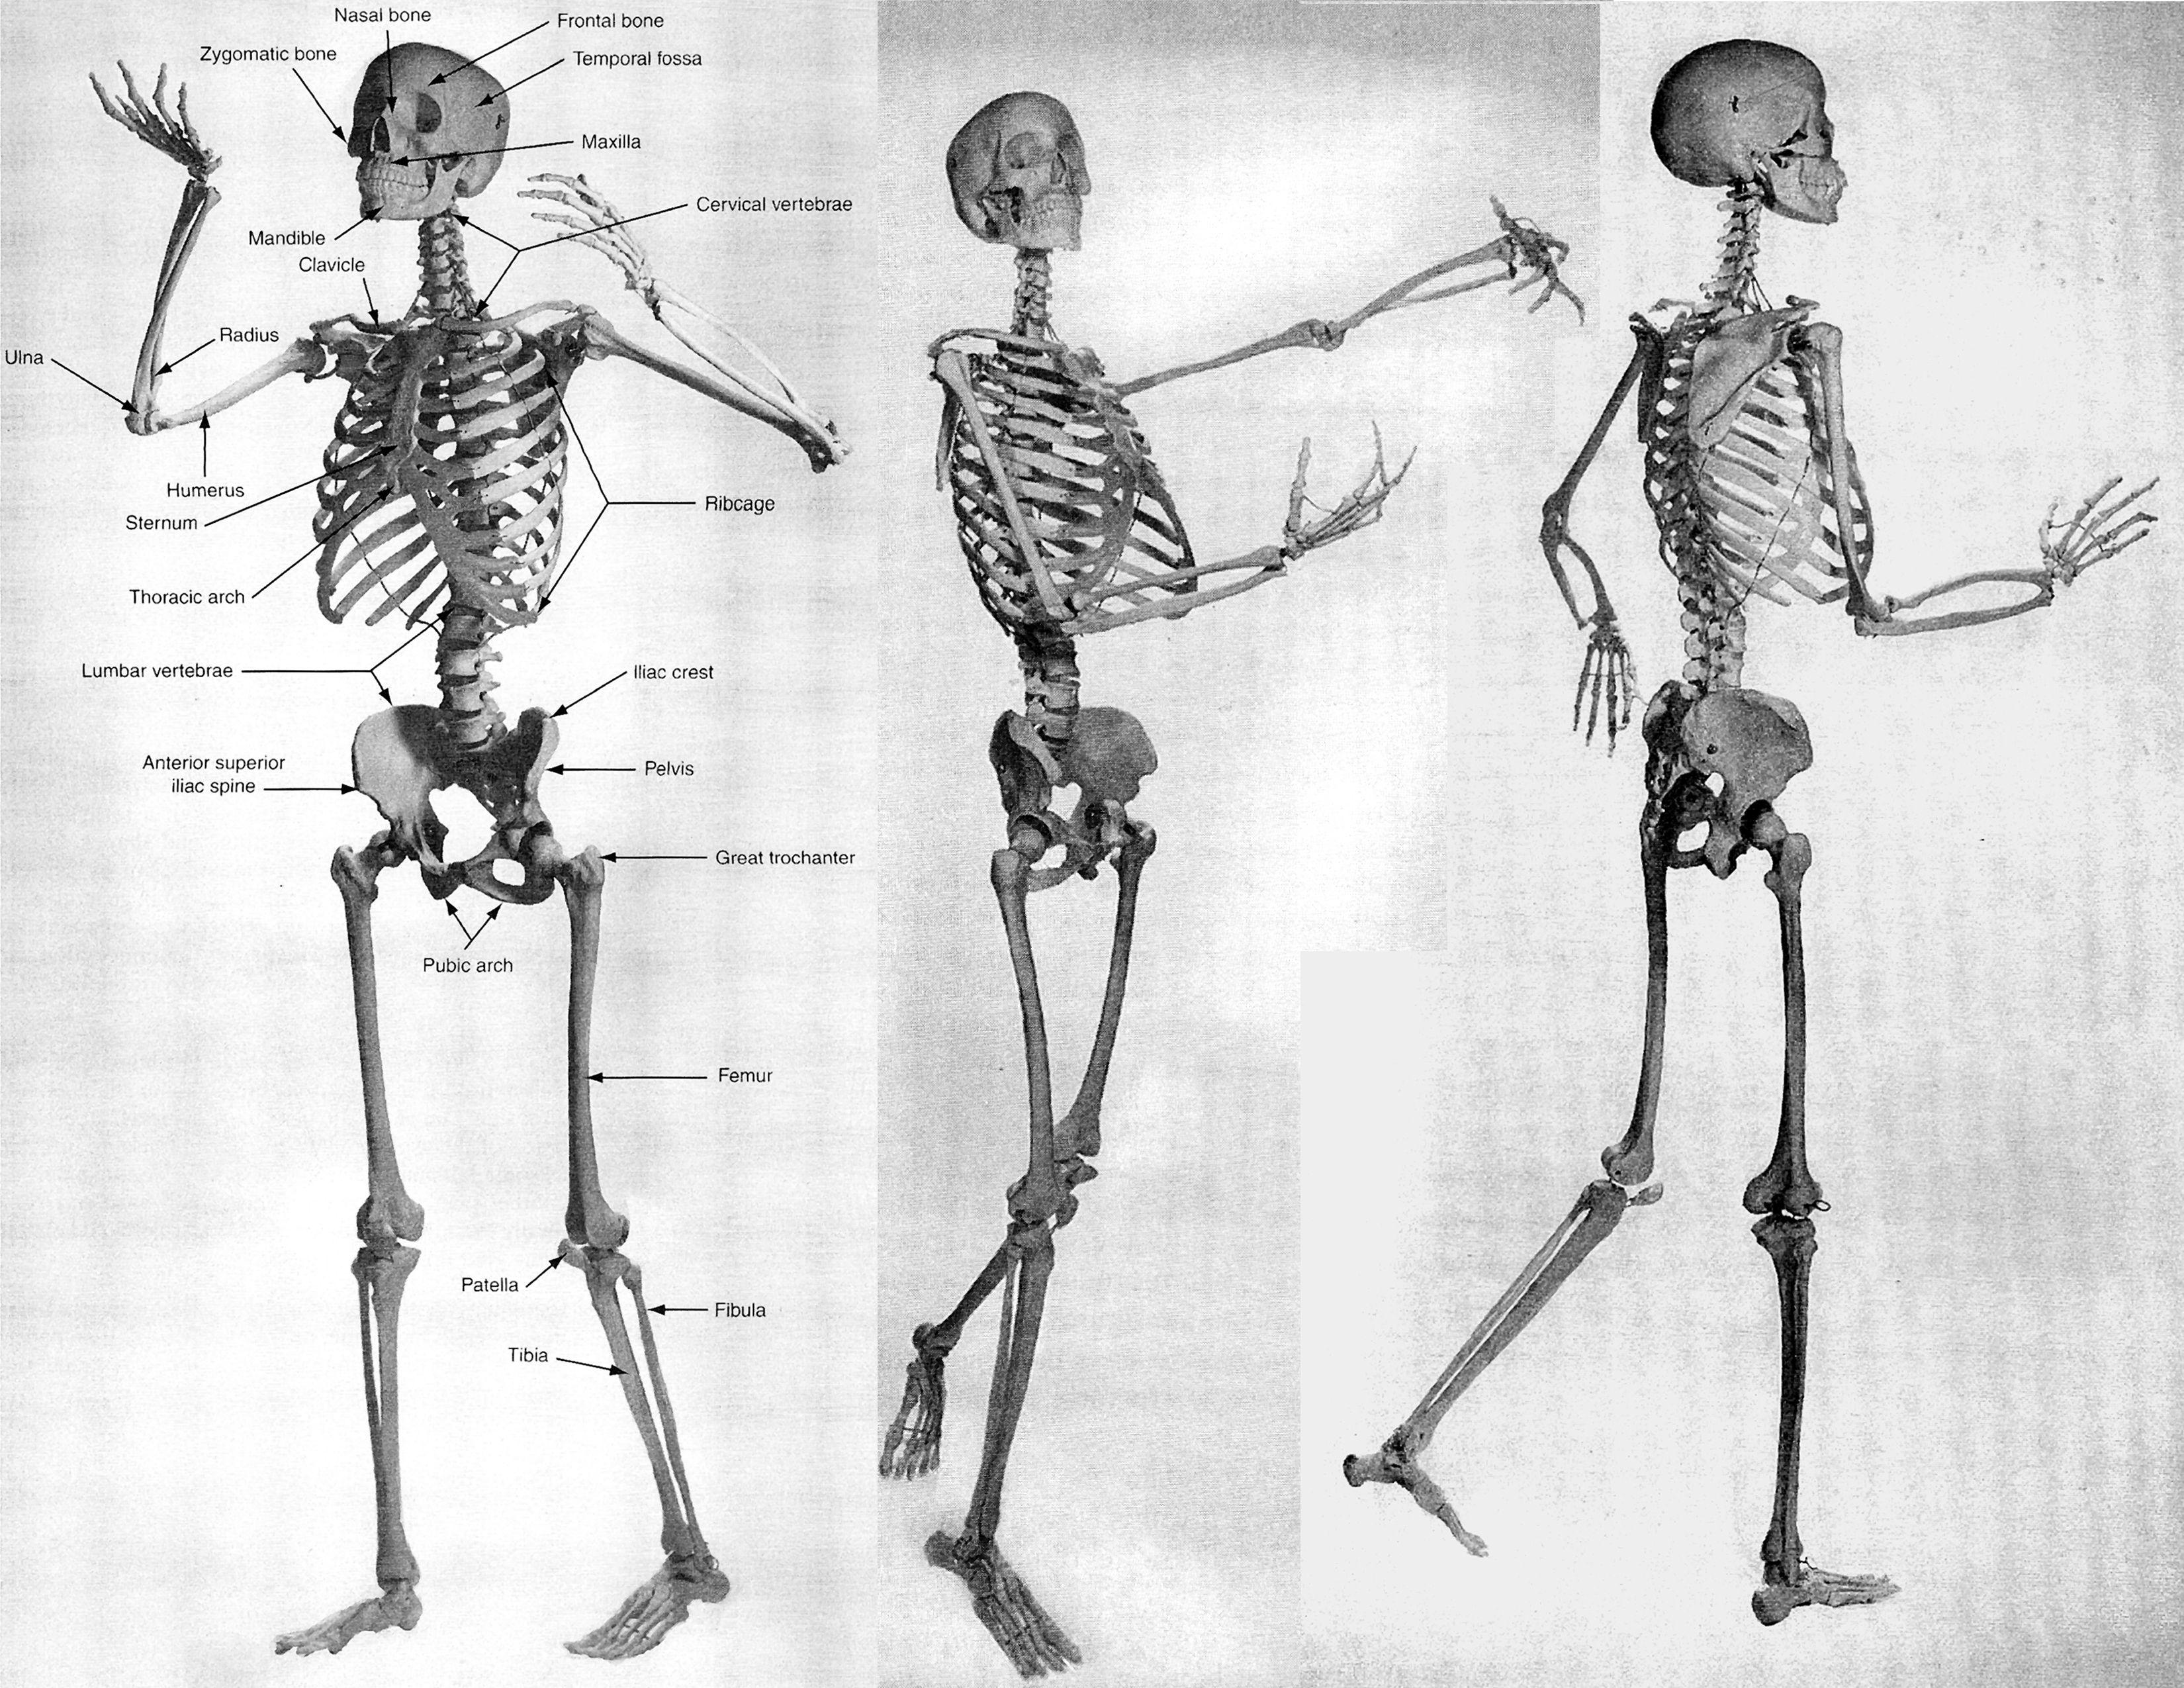 medium resolution of full skeleton diagram jpg 3300 2550 skeleton system human